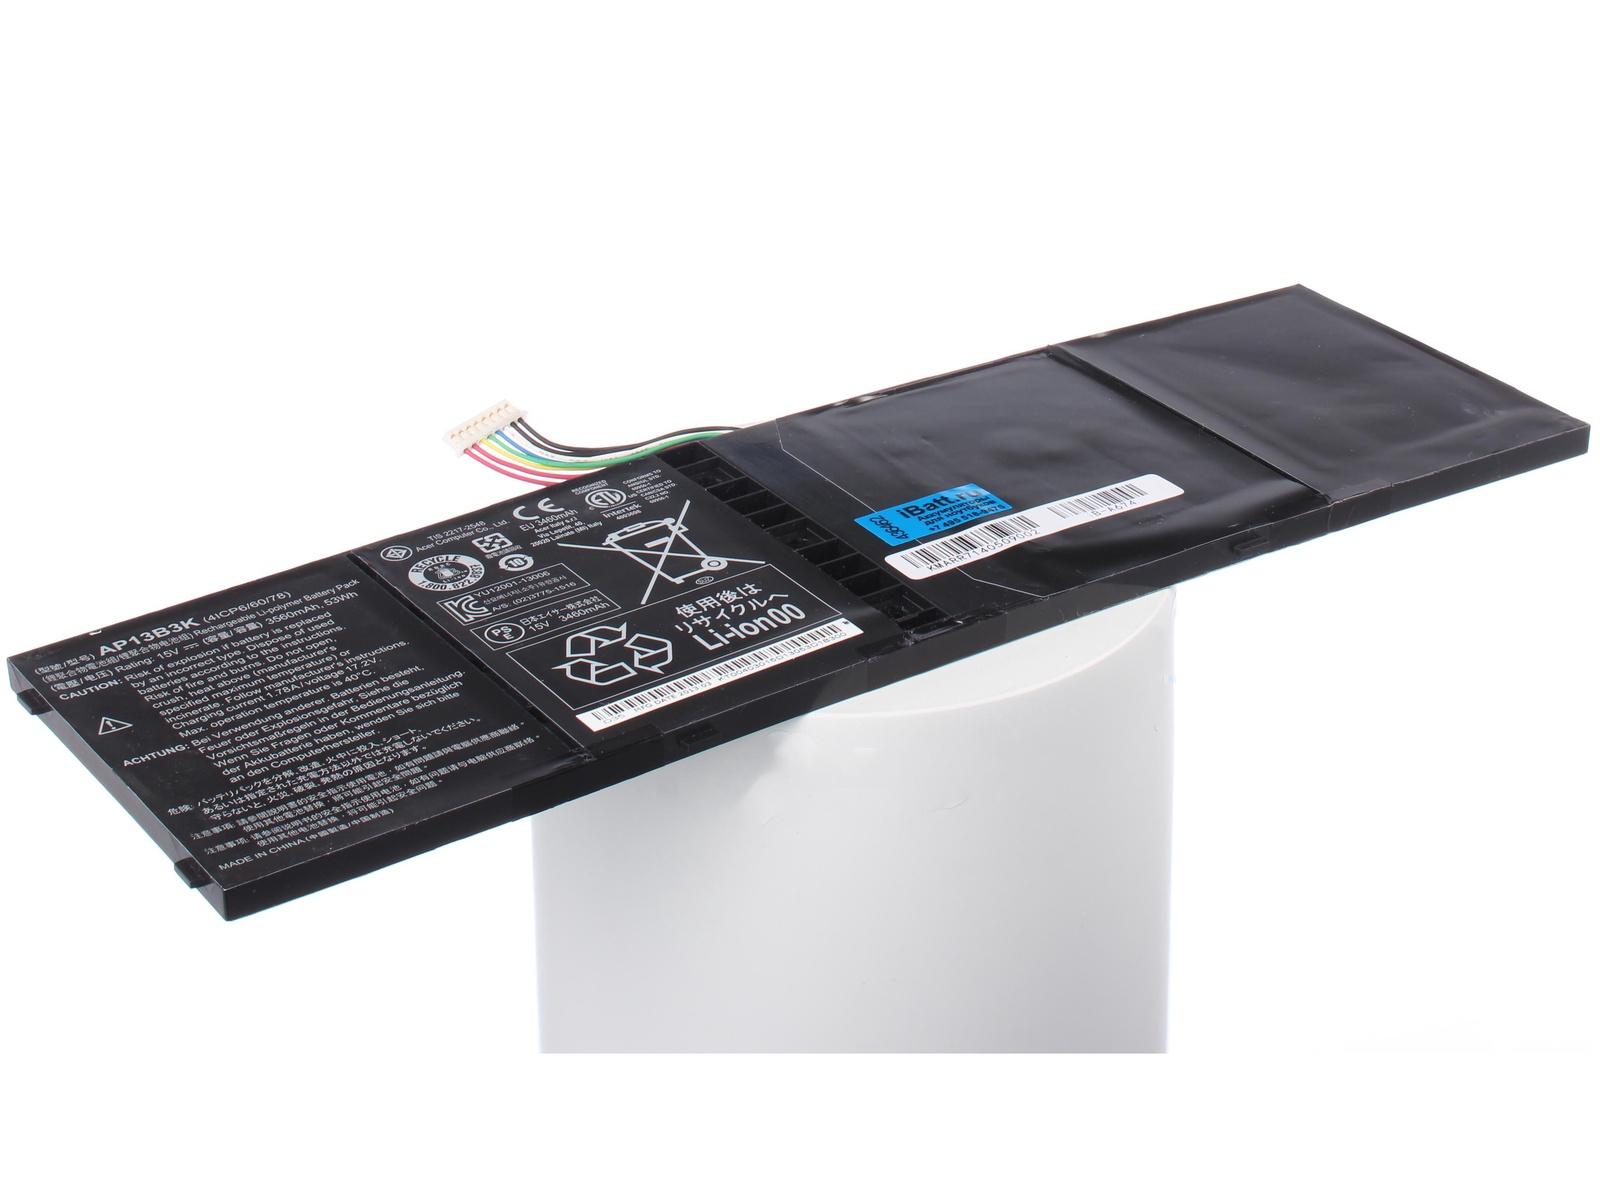 Аккумулятор для ноутбука iBatt для Acer Aspire V5-573G-34018G50a, Aspire V5-573G-54208G50akk, Aspire V5-573G-74506G50akk, Aspire V7-481PG-53334G52a, Aspire V7-582PG-74506G52tkk, Aspire R3-471TG-52YZ, Aspire V5-572G-53336G50a цена